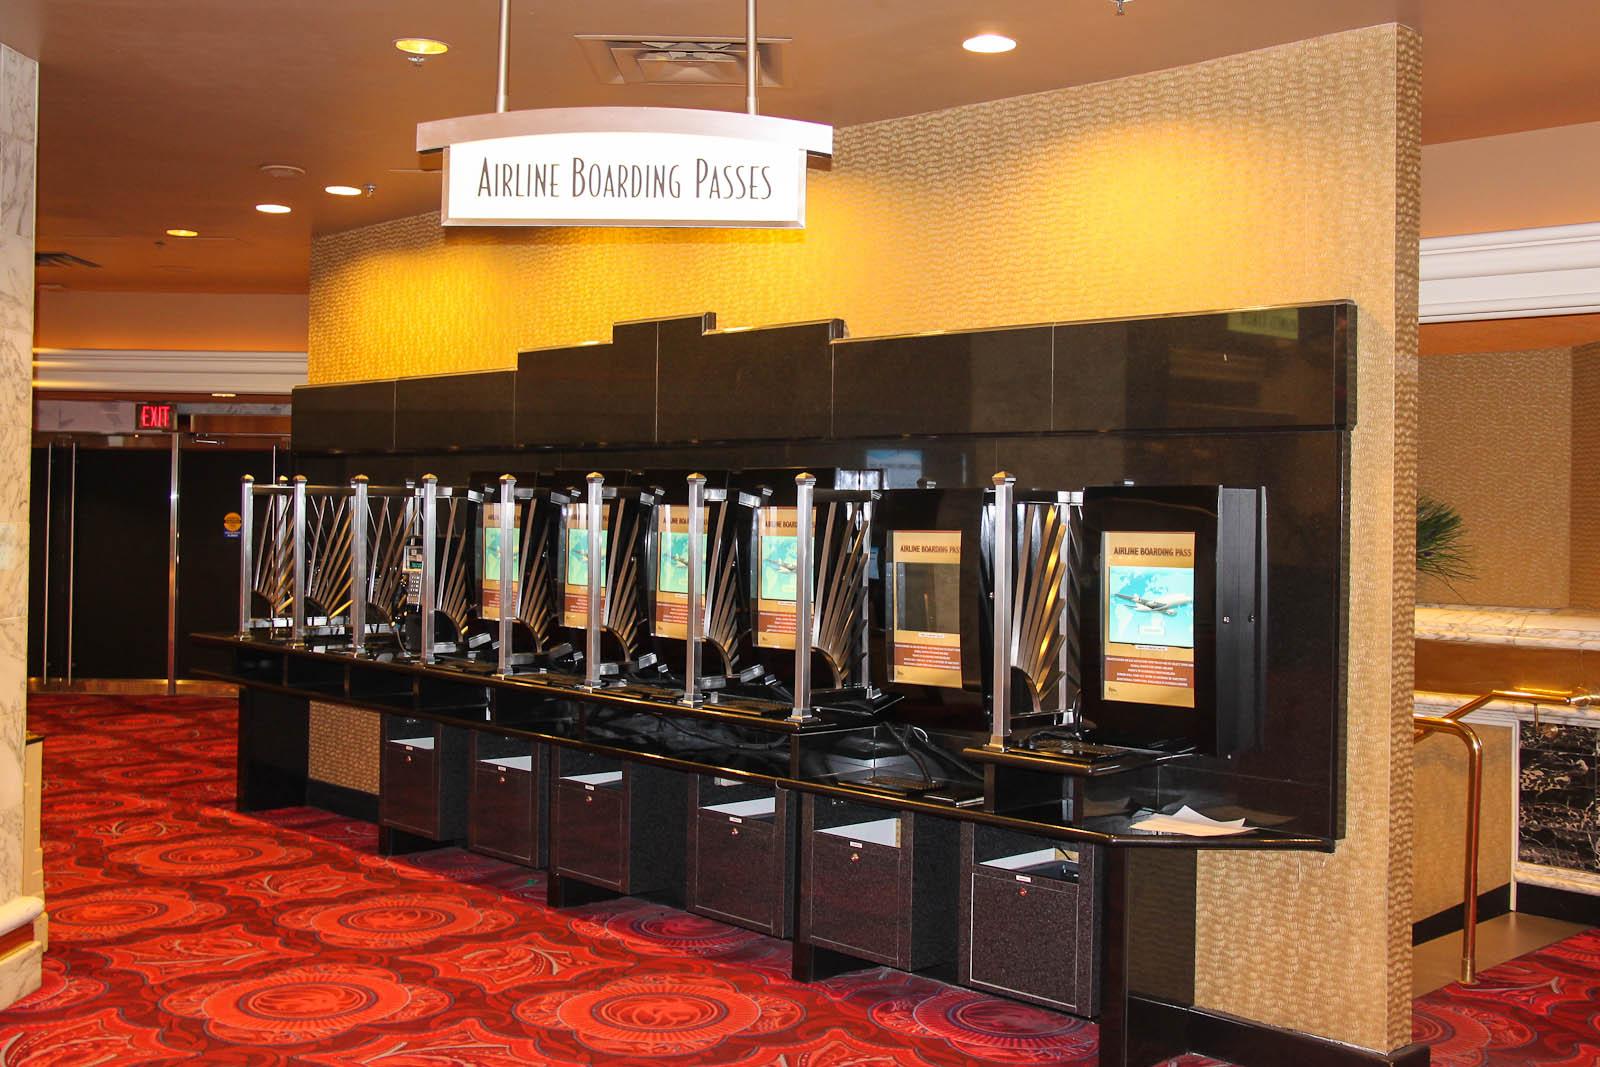 Стойки саморегистрации на авиарейсы в отеле MGM Grand в Лас-Вегасе